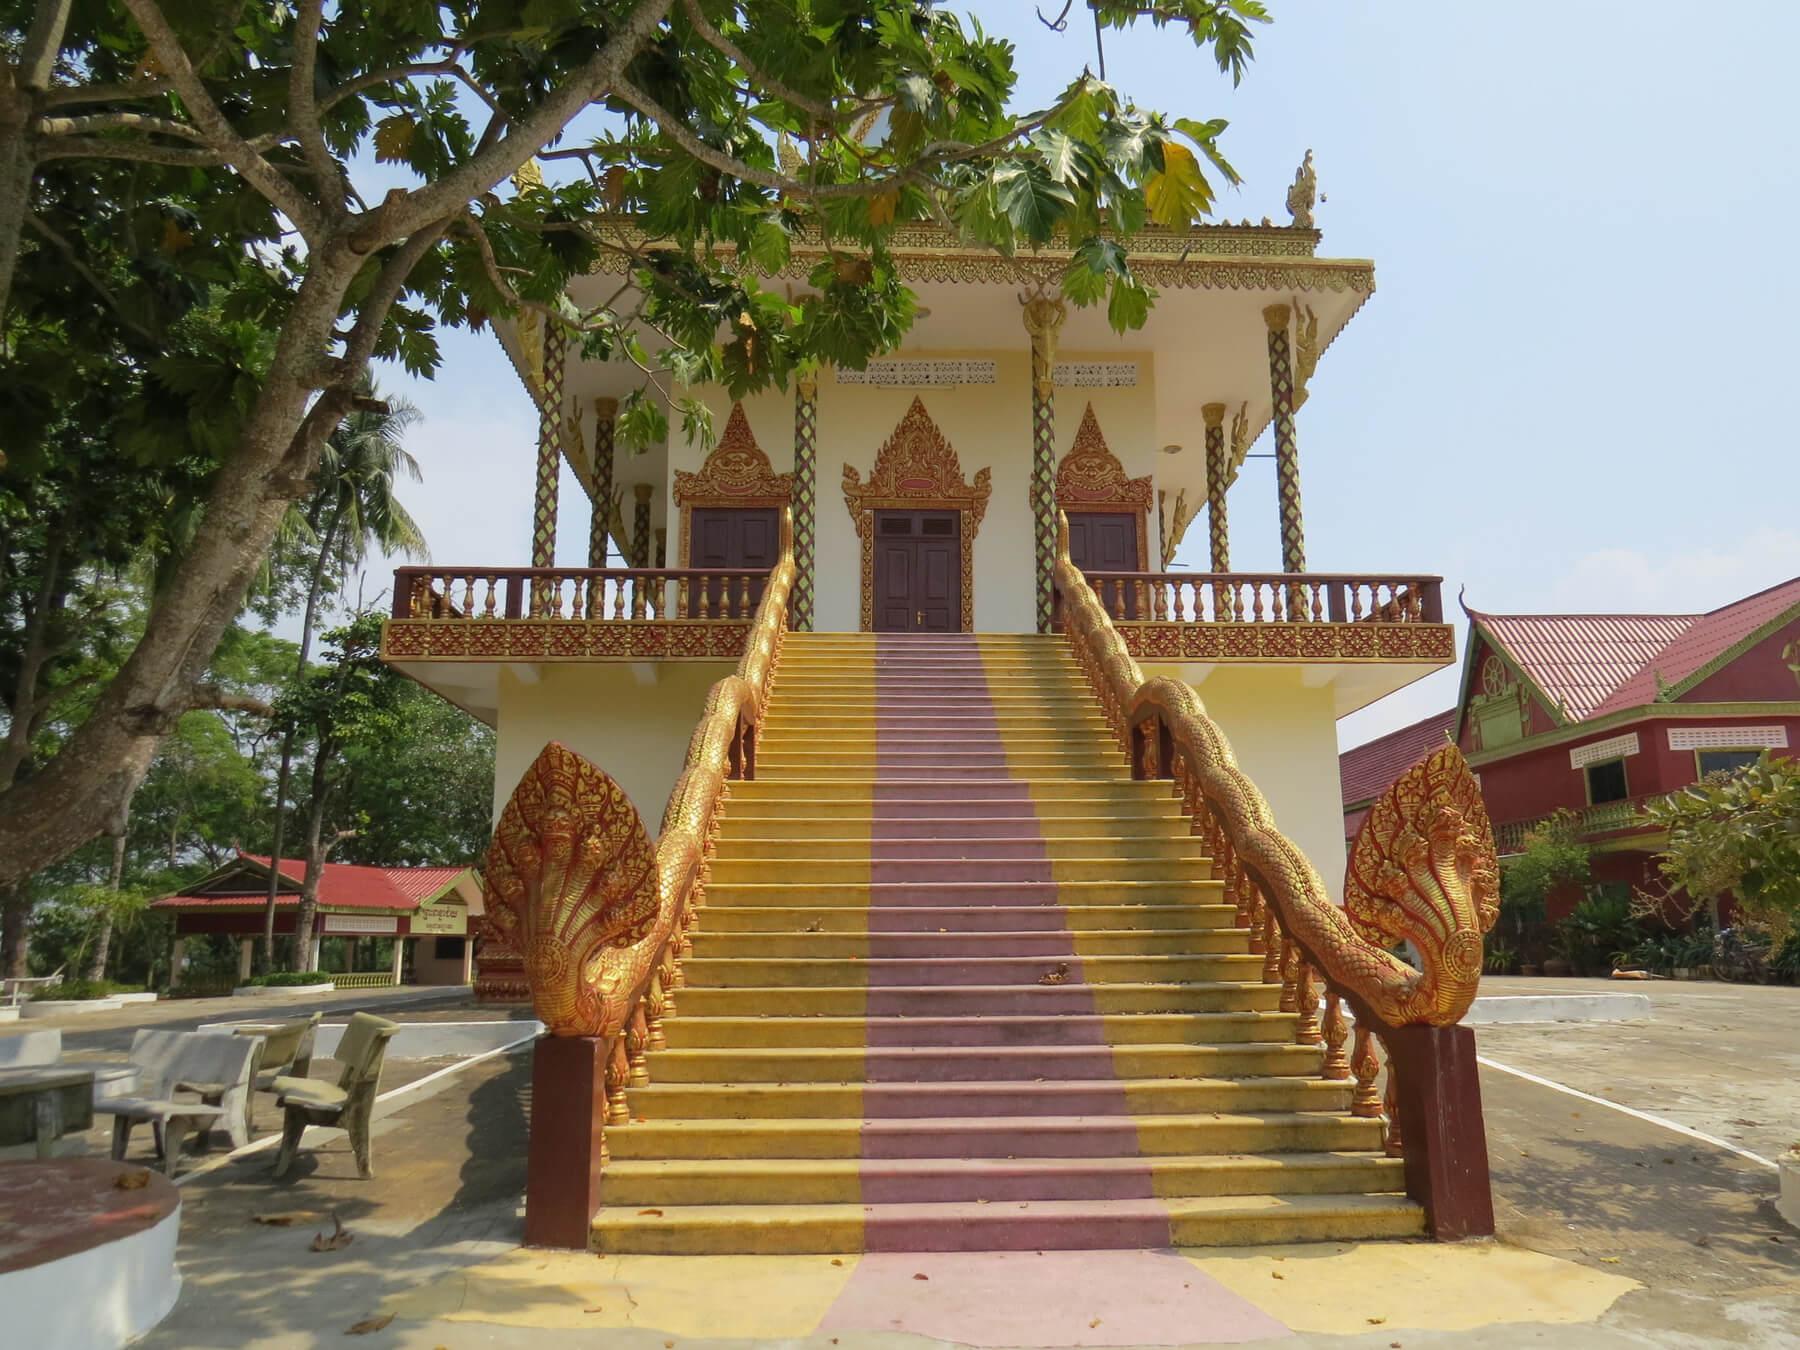 Буддийский храм Ват Леу